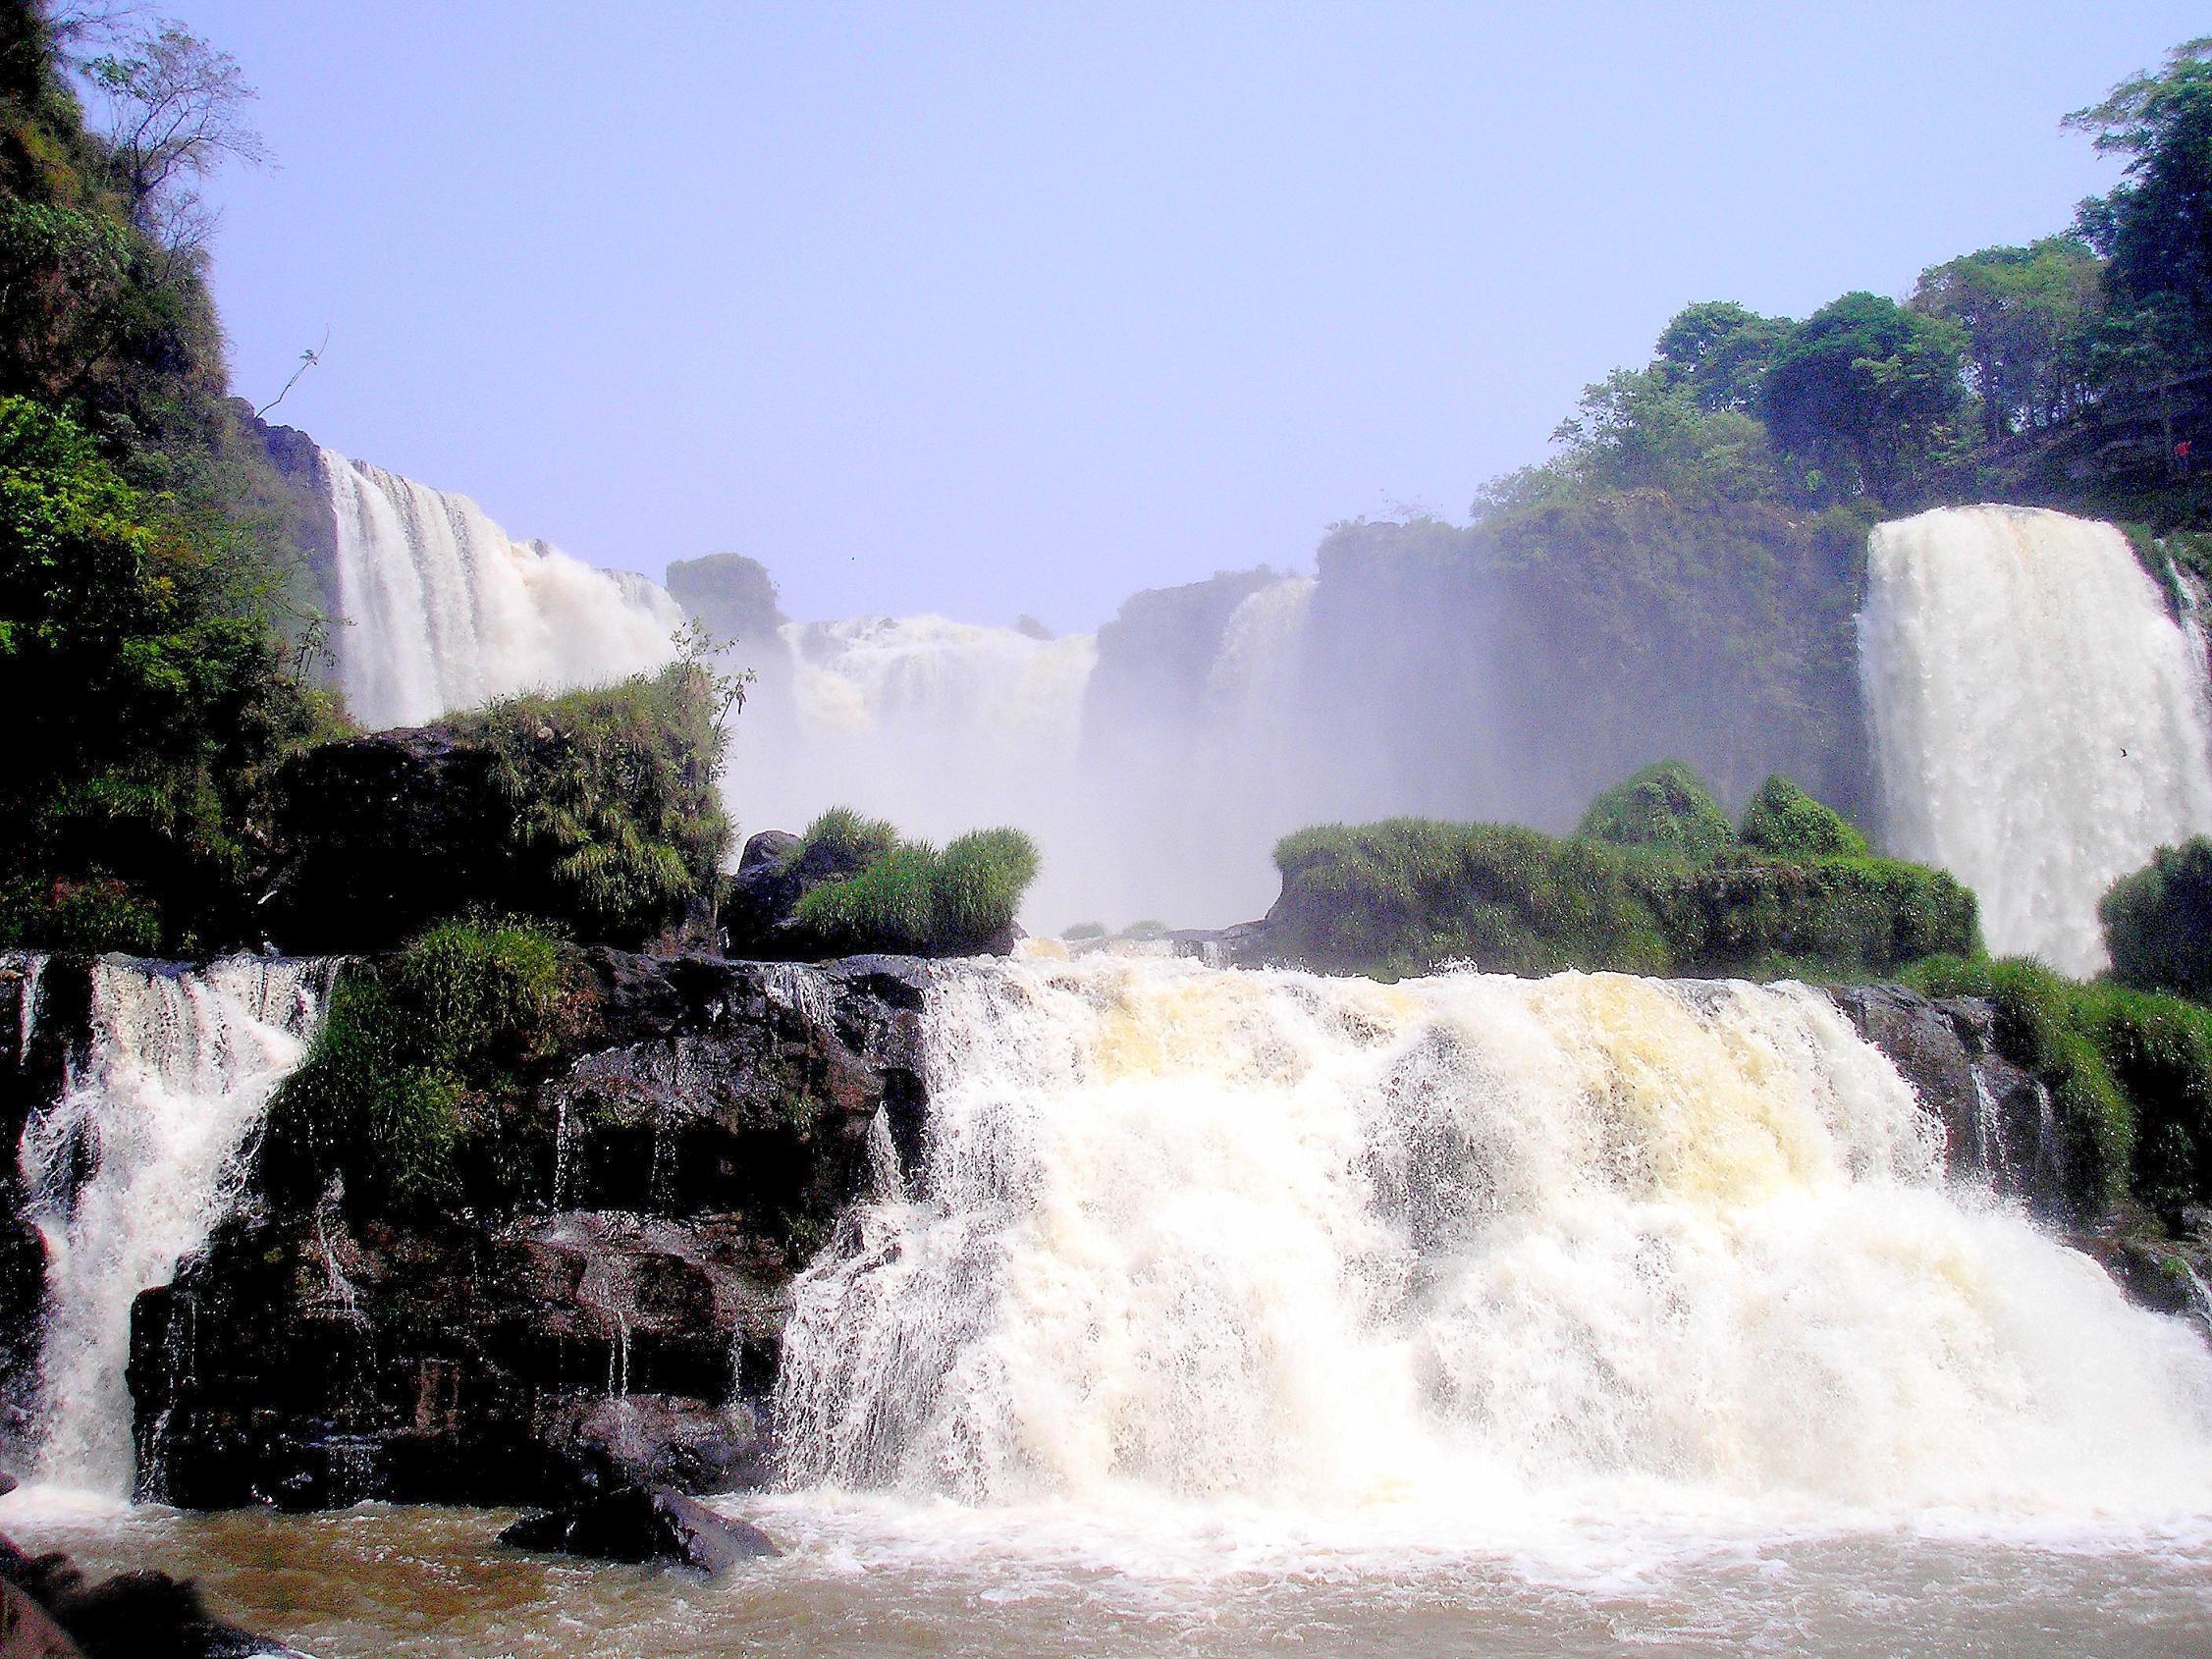 Saltos del Monday Waterfall